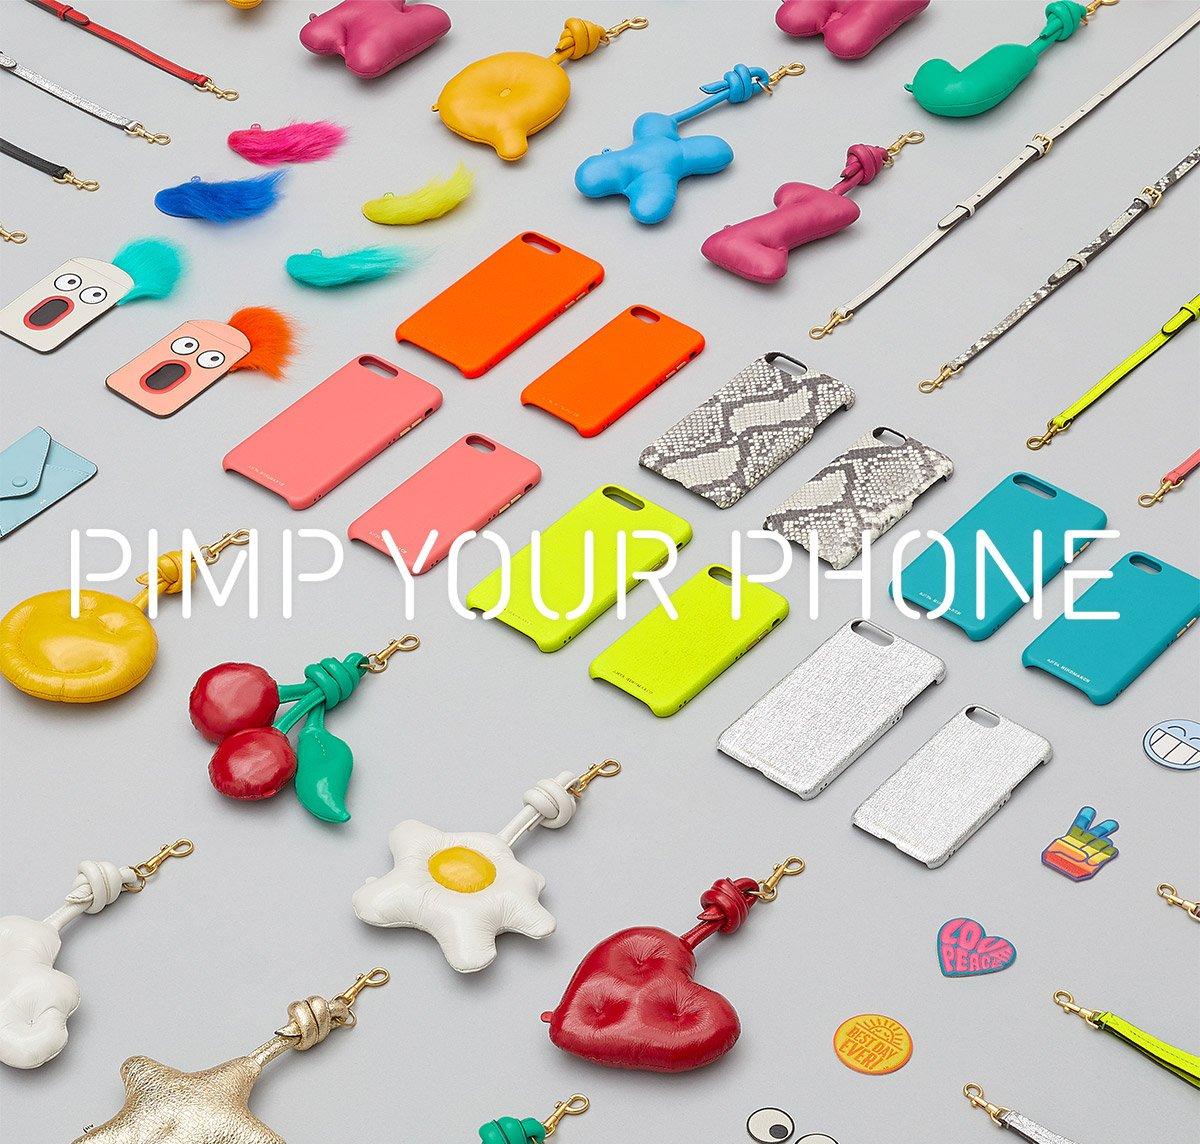 Discover Pimp Your Phone